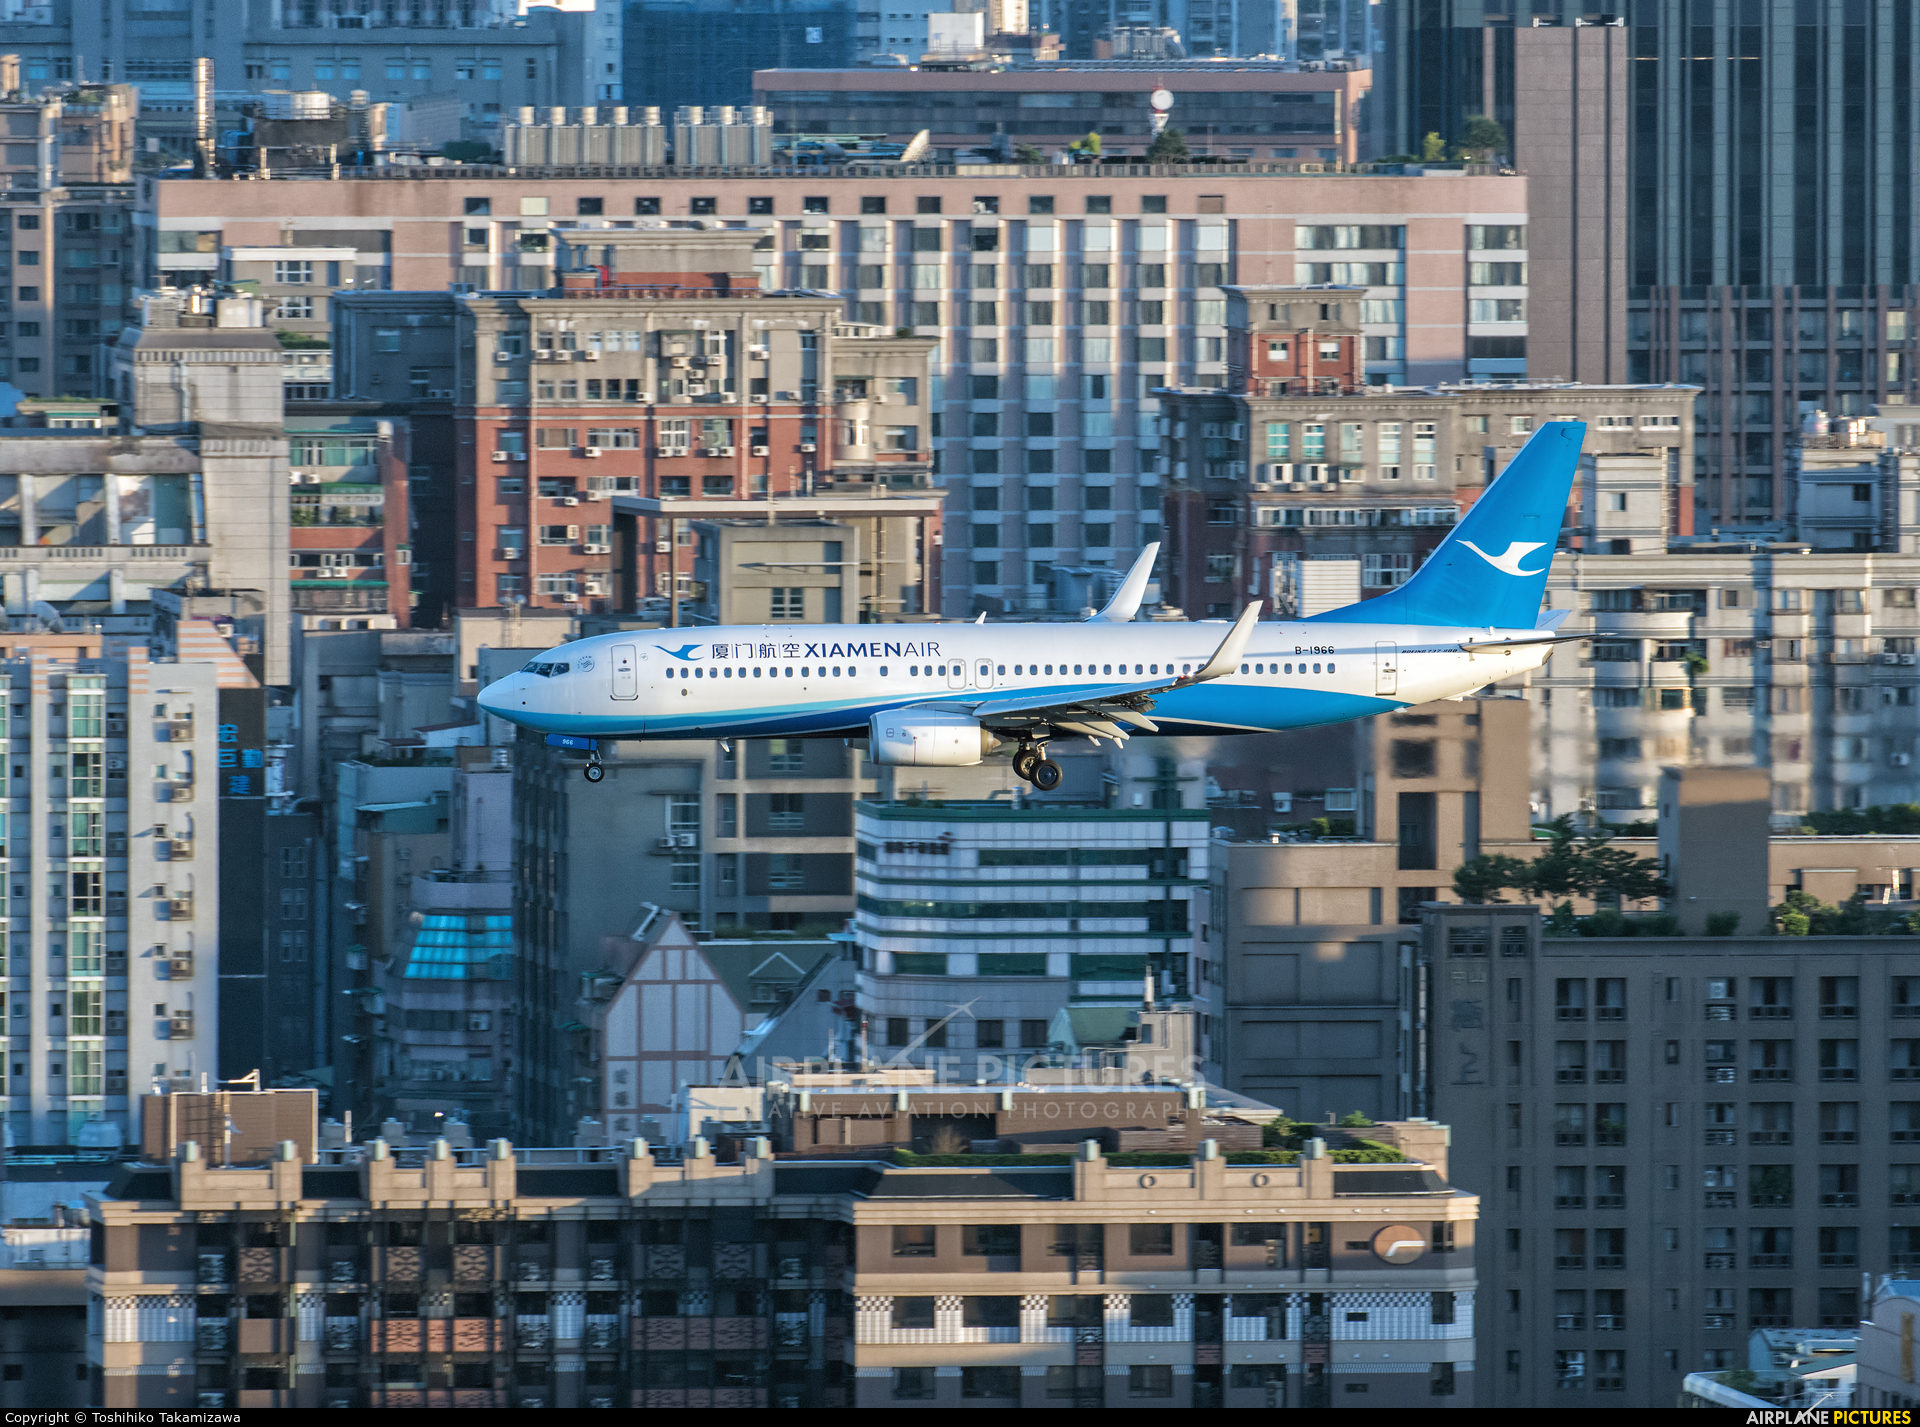 Xiamen Airlines B-1966 aircraft at Taipei Sung Shan/Songshan Airport